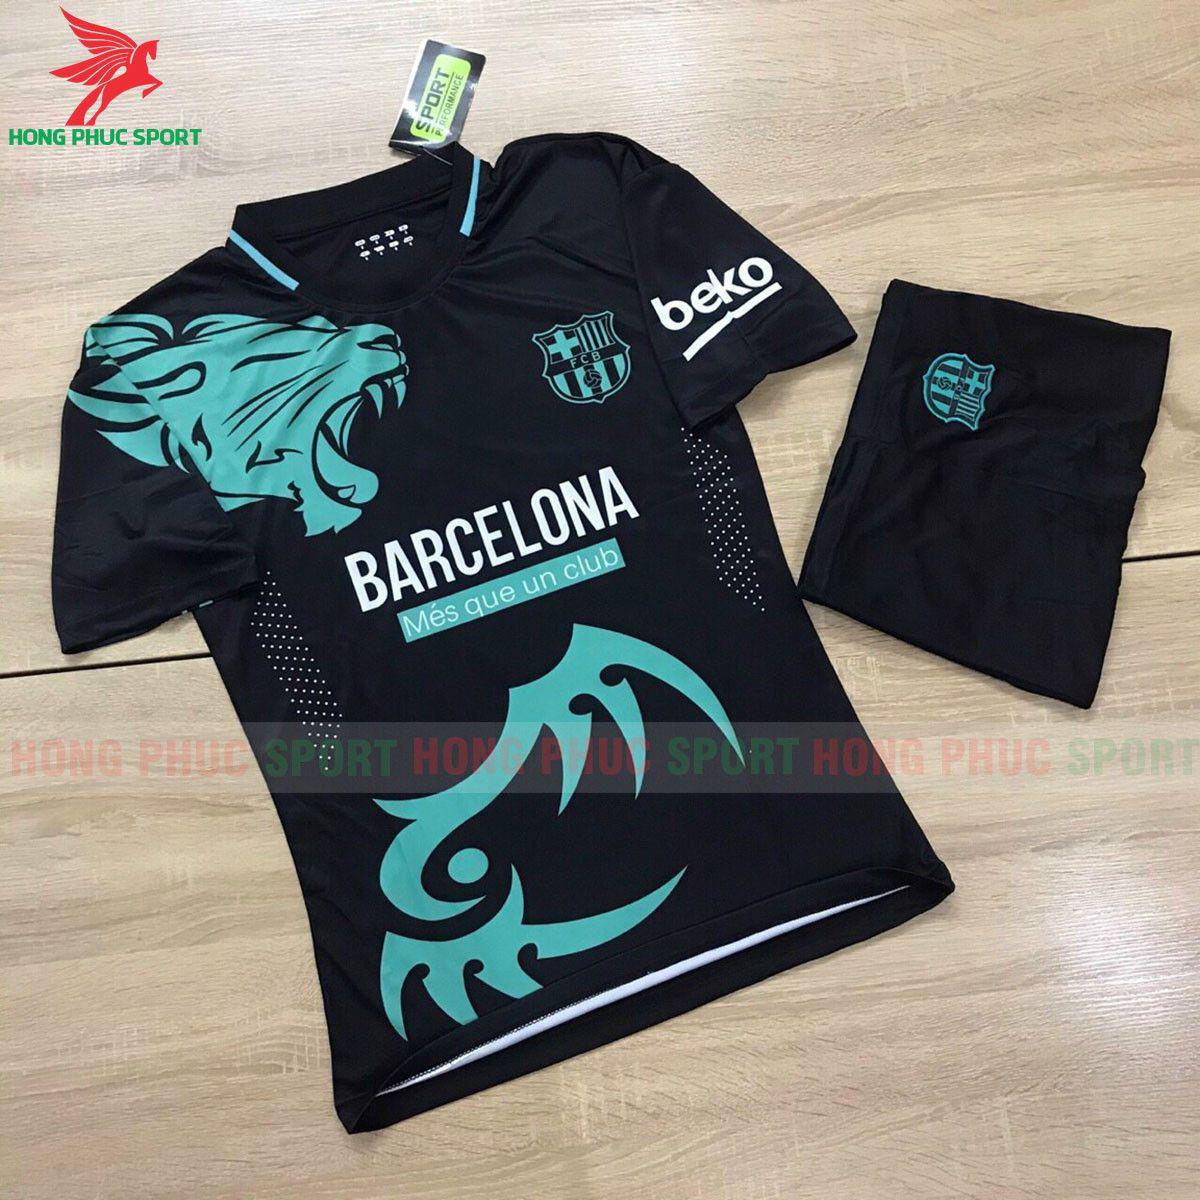 https://cdn.hongphucsport.com/unsafe/s4.shopbay.vn/files/285/ao-bong-da-barcelona-2021-2022-phien-ban-fan-mau-1-60d3f9a9e9b25.jpg